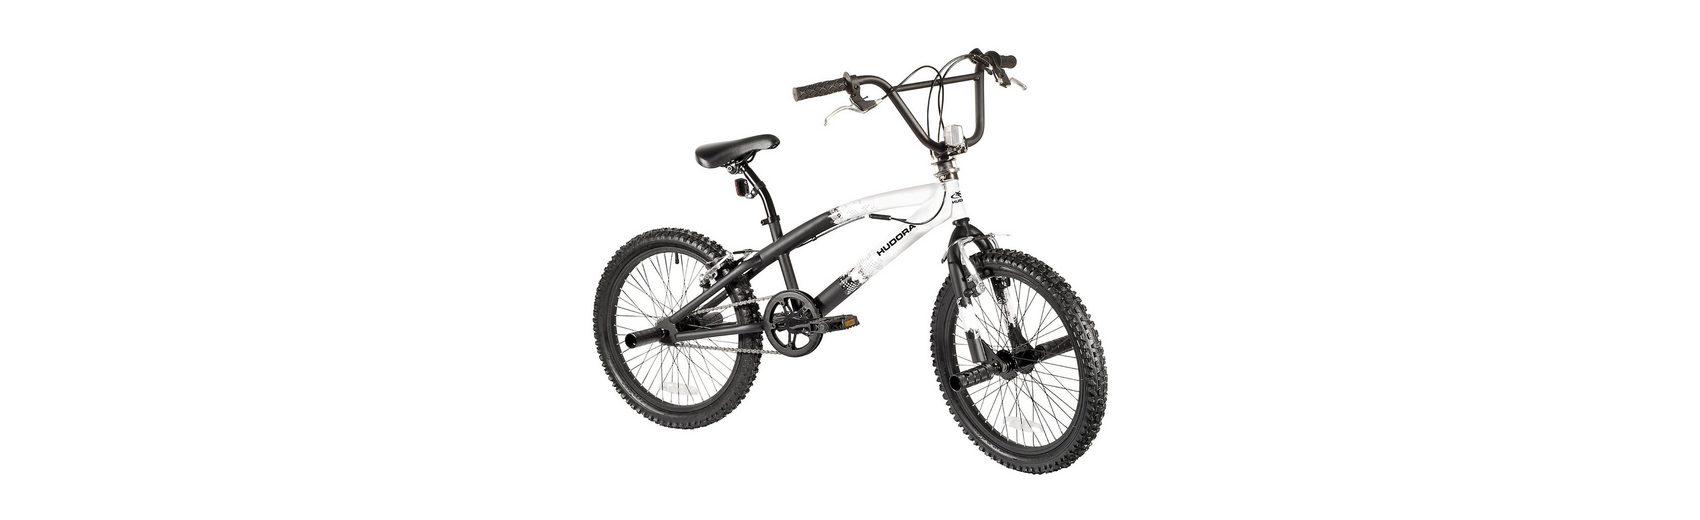 Hudora Freestyle Fahrrad 20 Zoll